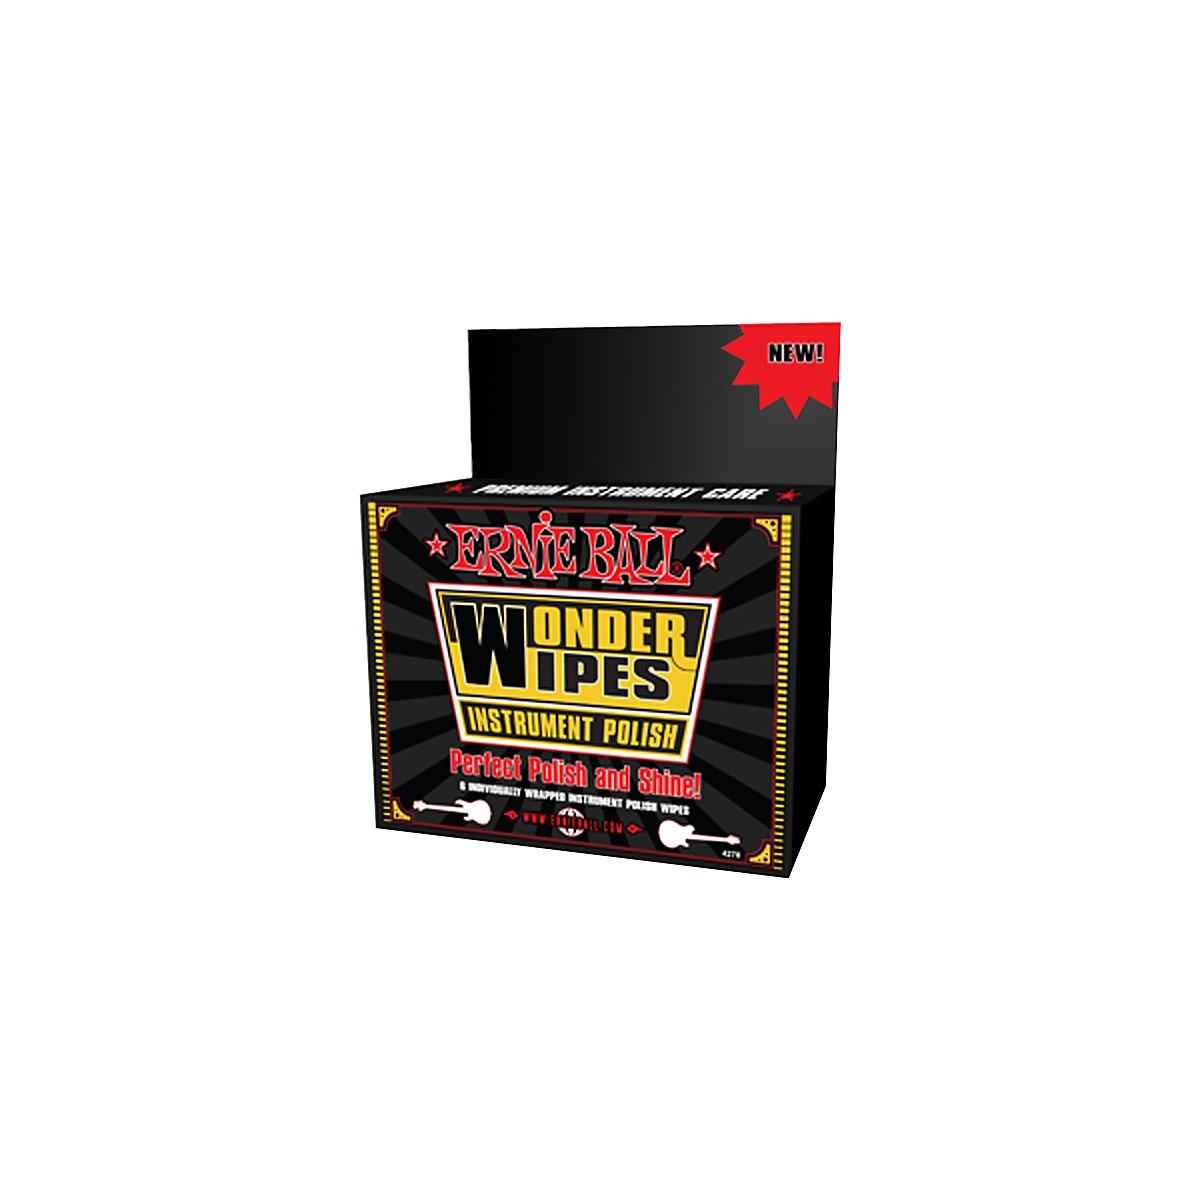 Ernie Ball Wonder Wipe Instrument Polish 6-pack